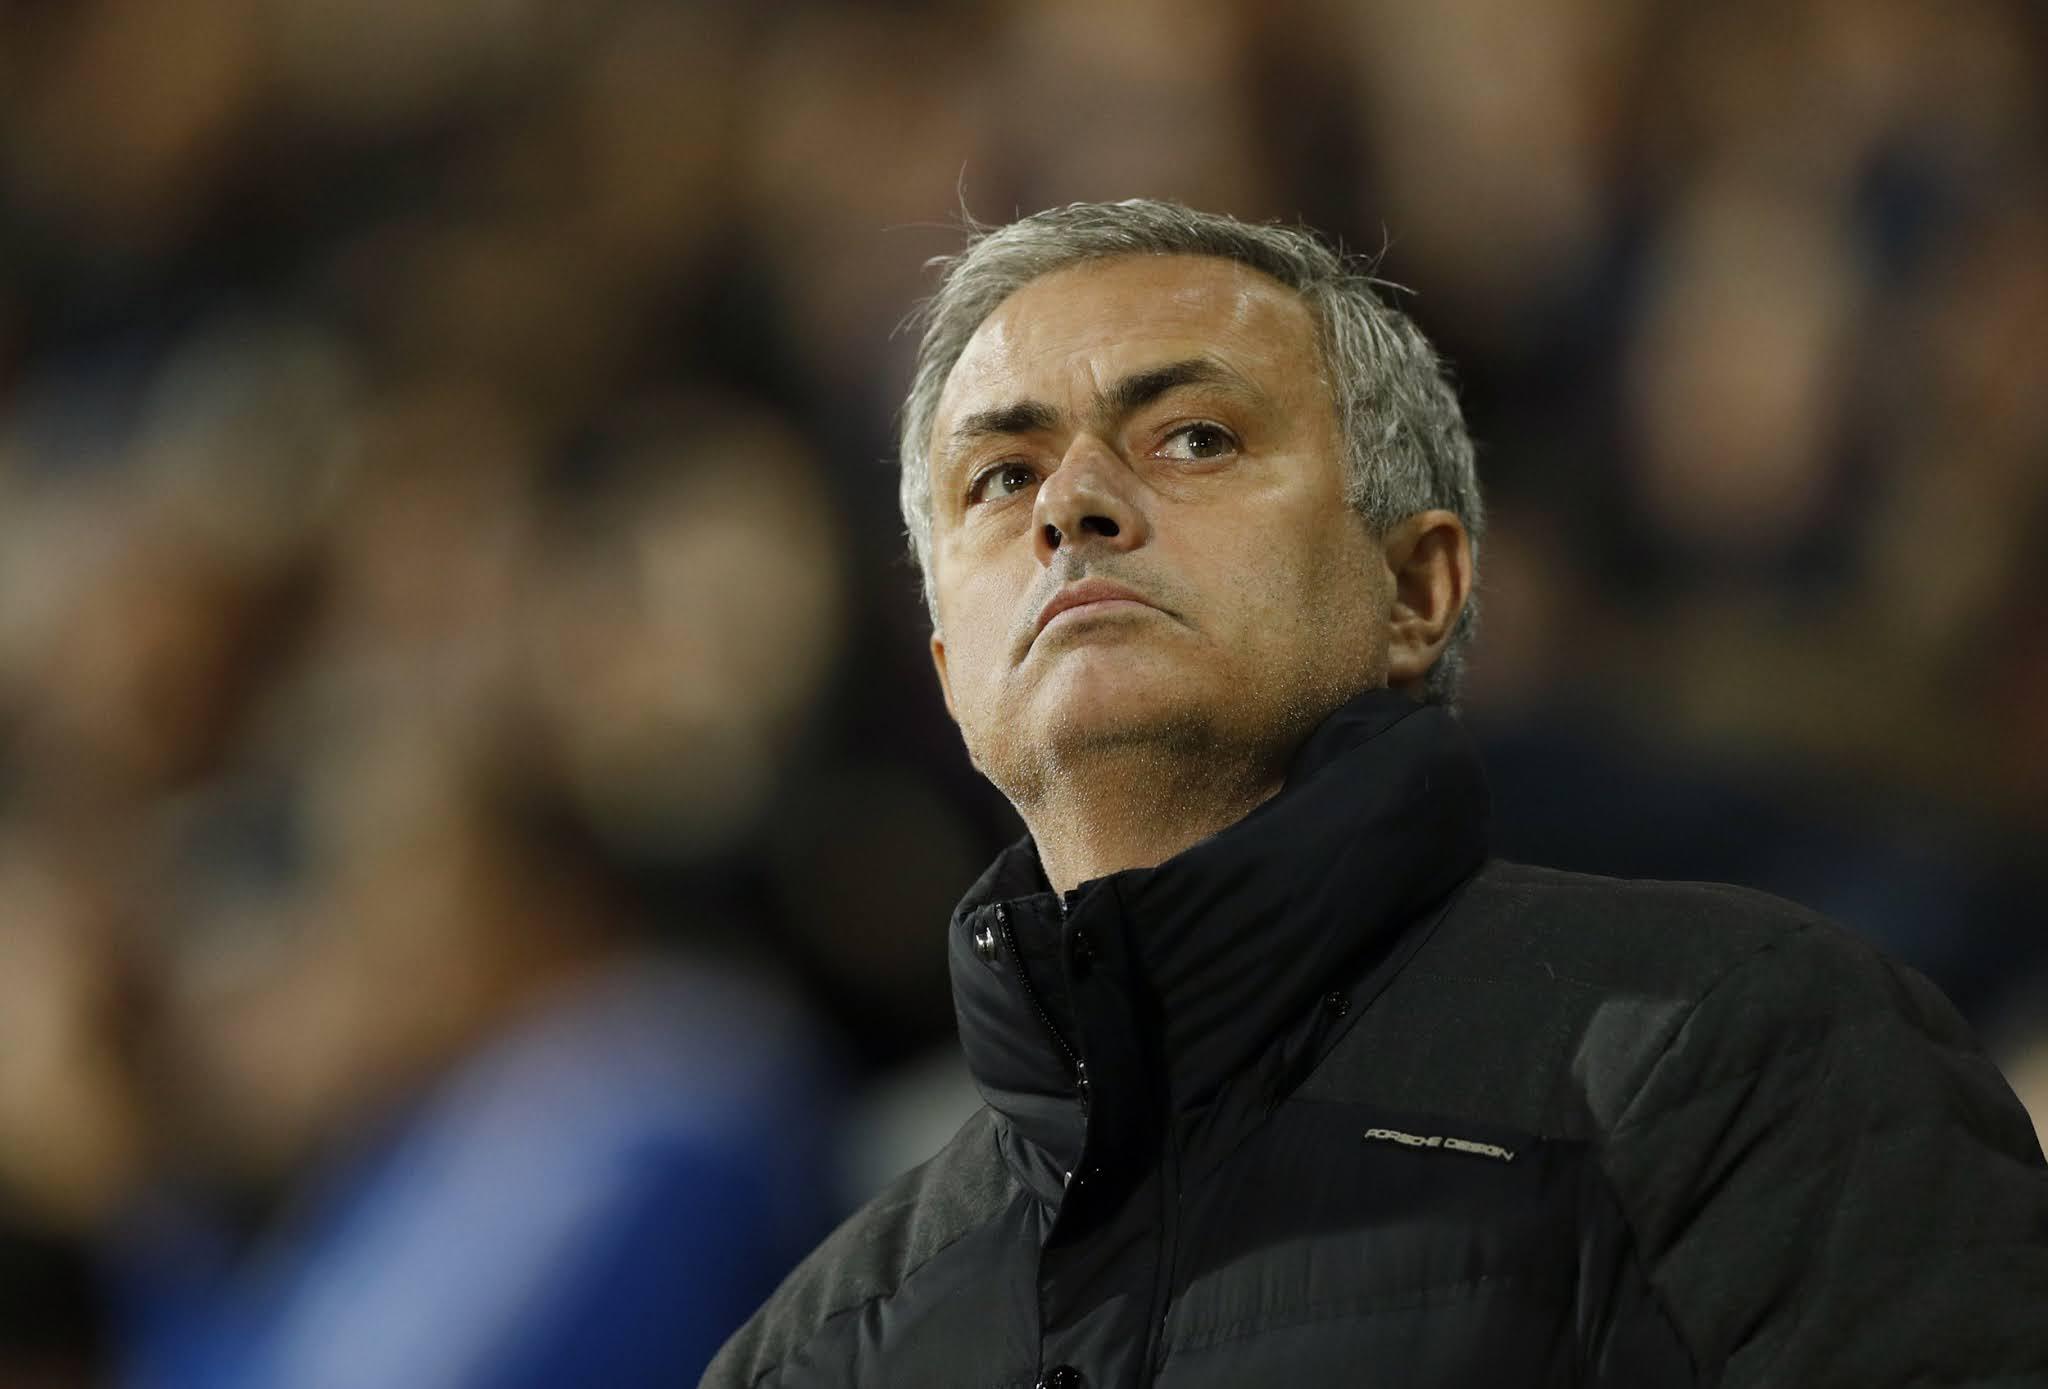 Jose Mourinho resmi melatih AS Roma di musim depan